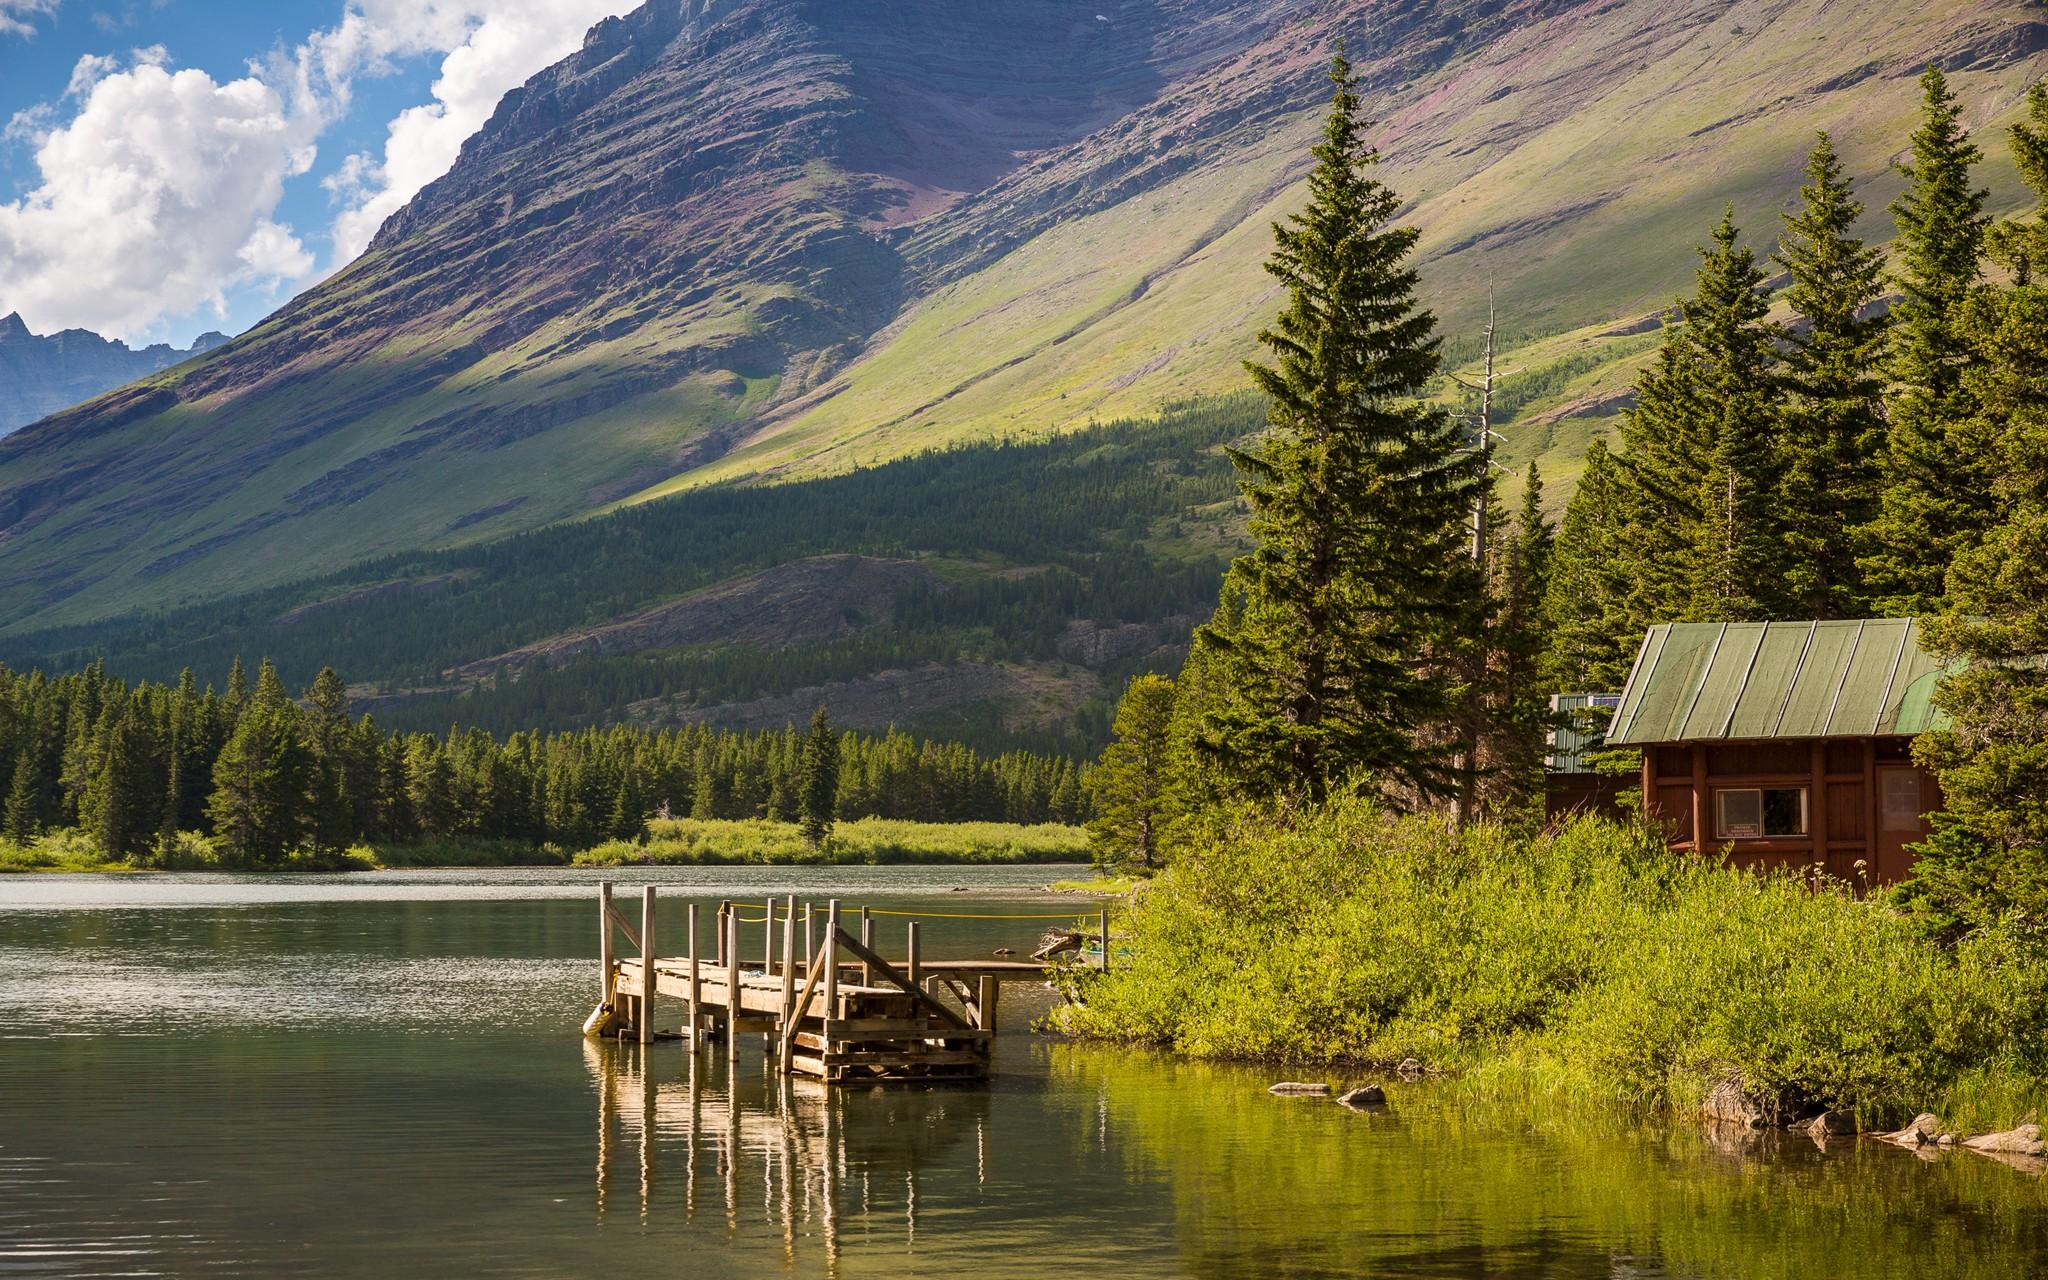 Lake House In Montana   2048x1280   Download HD Wallpaper 2048x1280